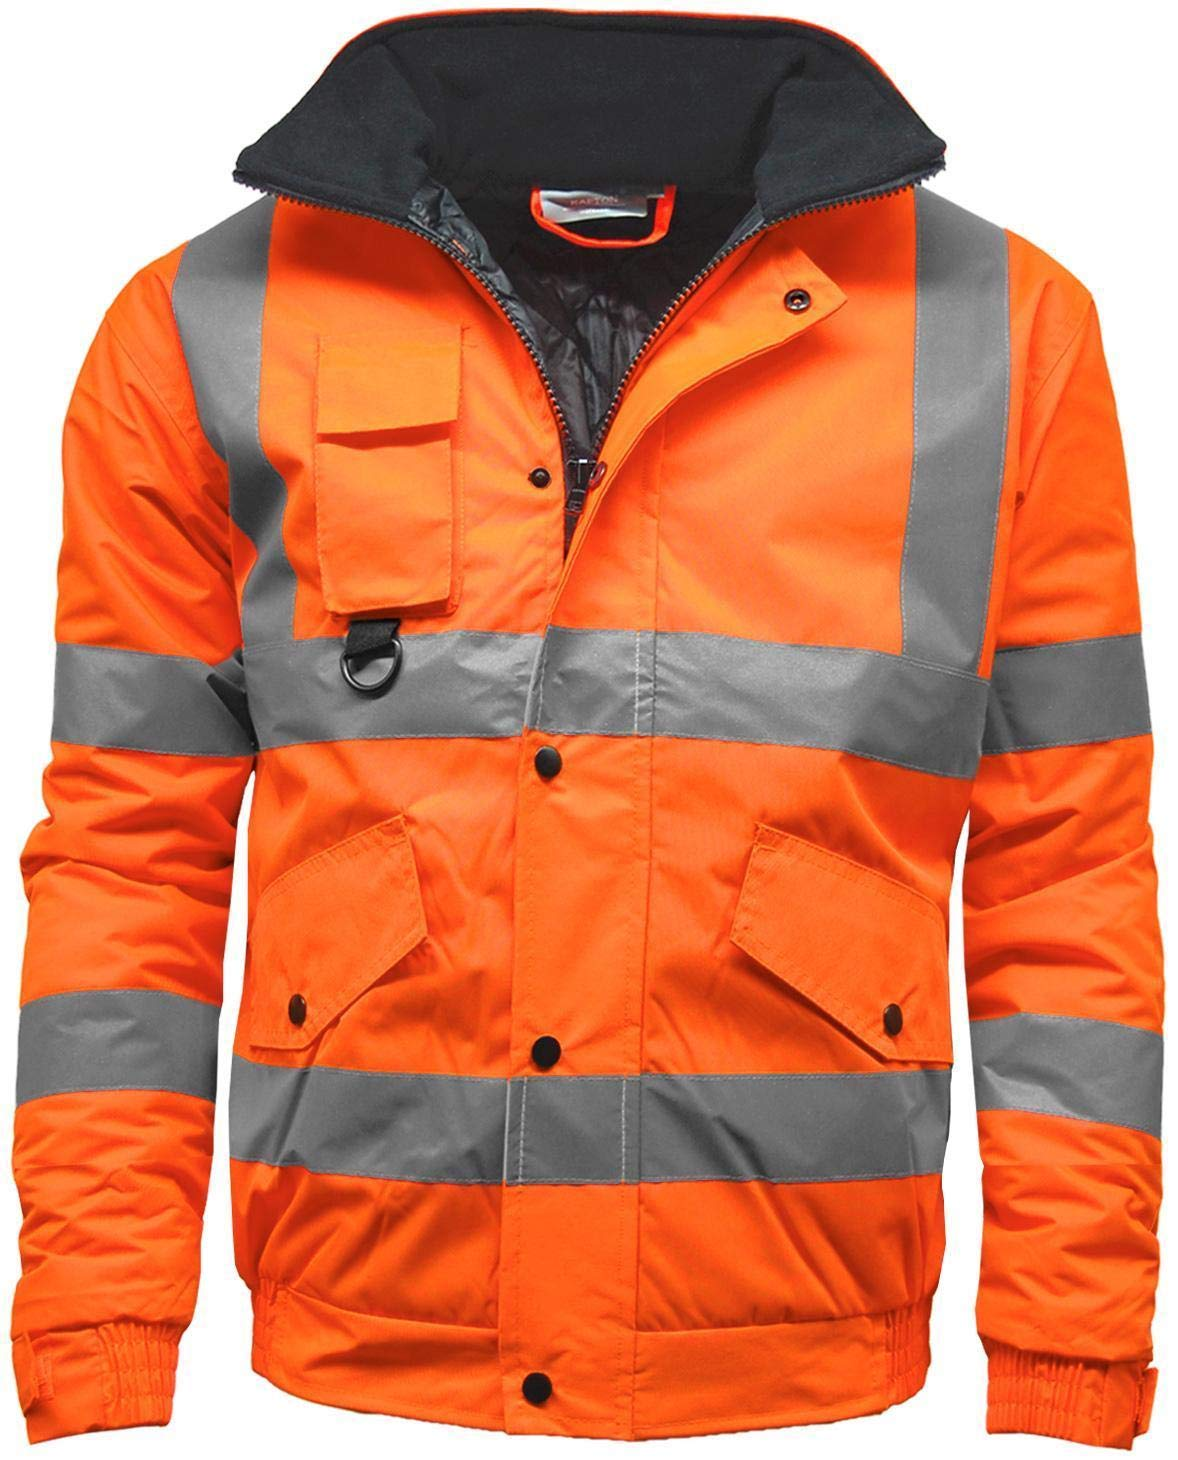 KAPTON. Mens Waterproof Hi Visibility Two Tone Safety Quilted Bomber Jacket Standard Safety Work Wear Jackets Orange X-Large